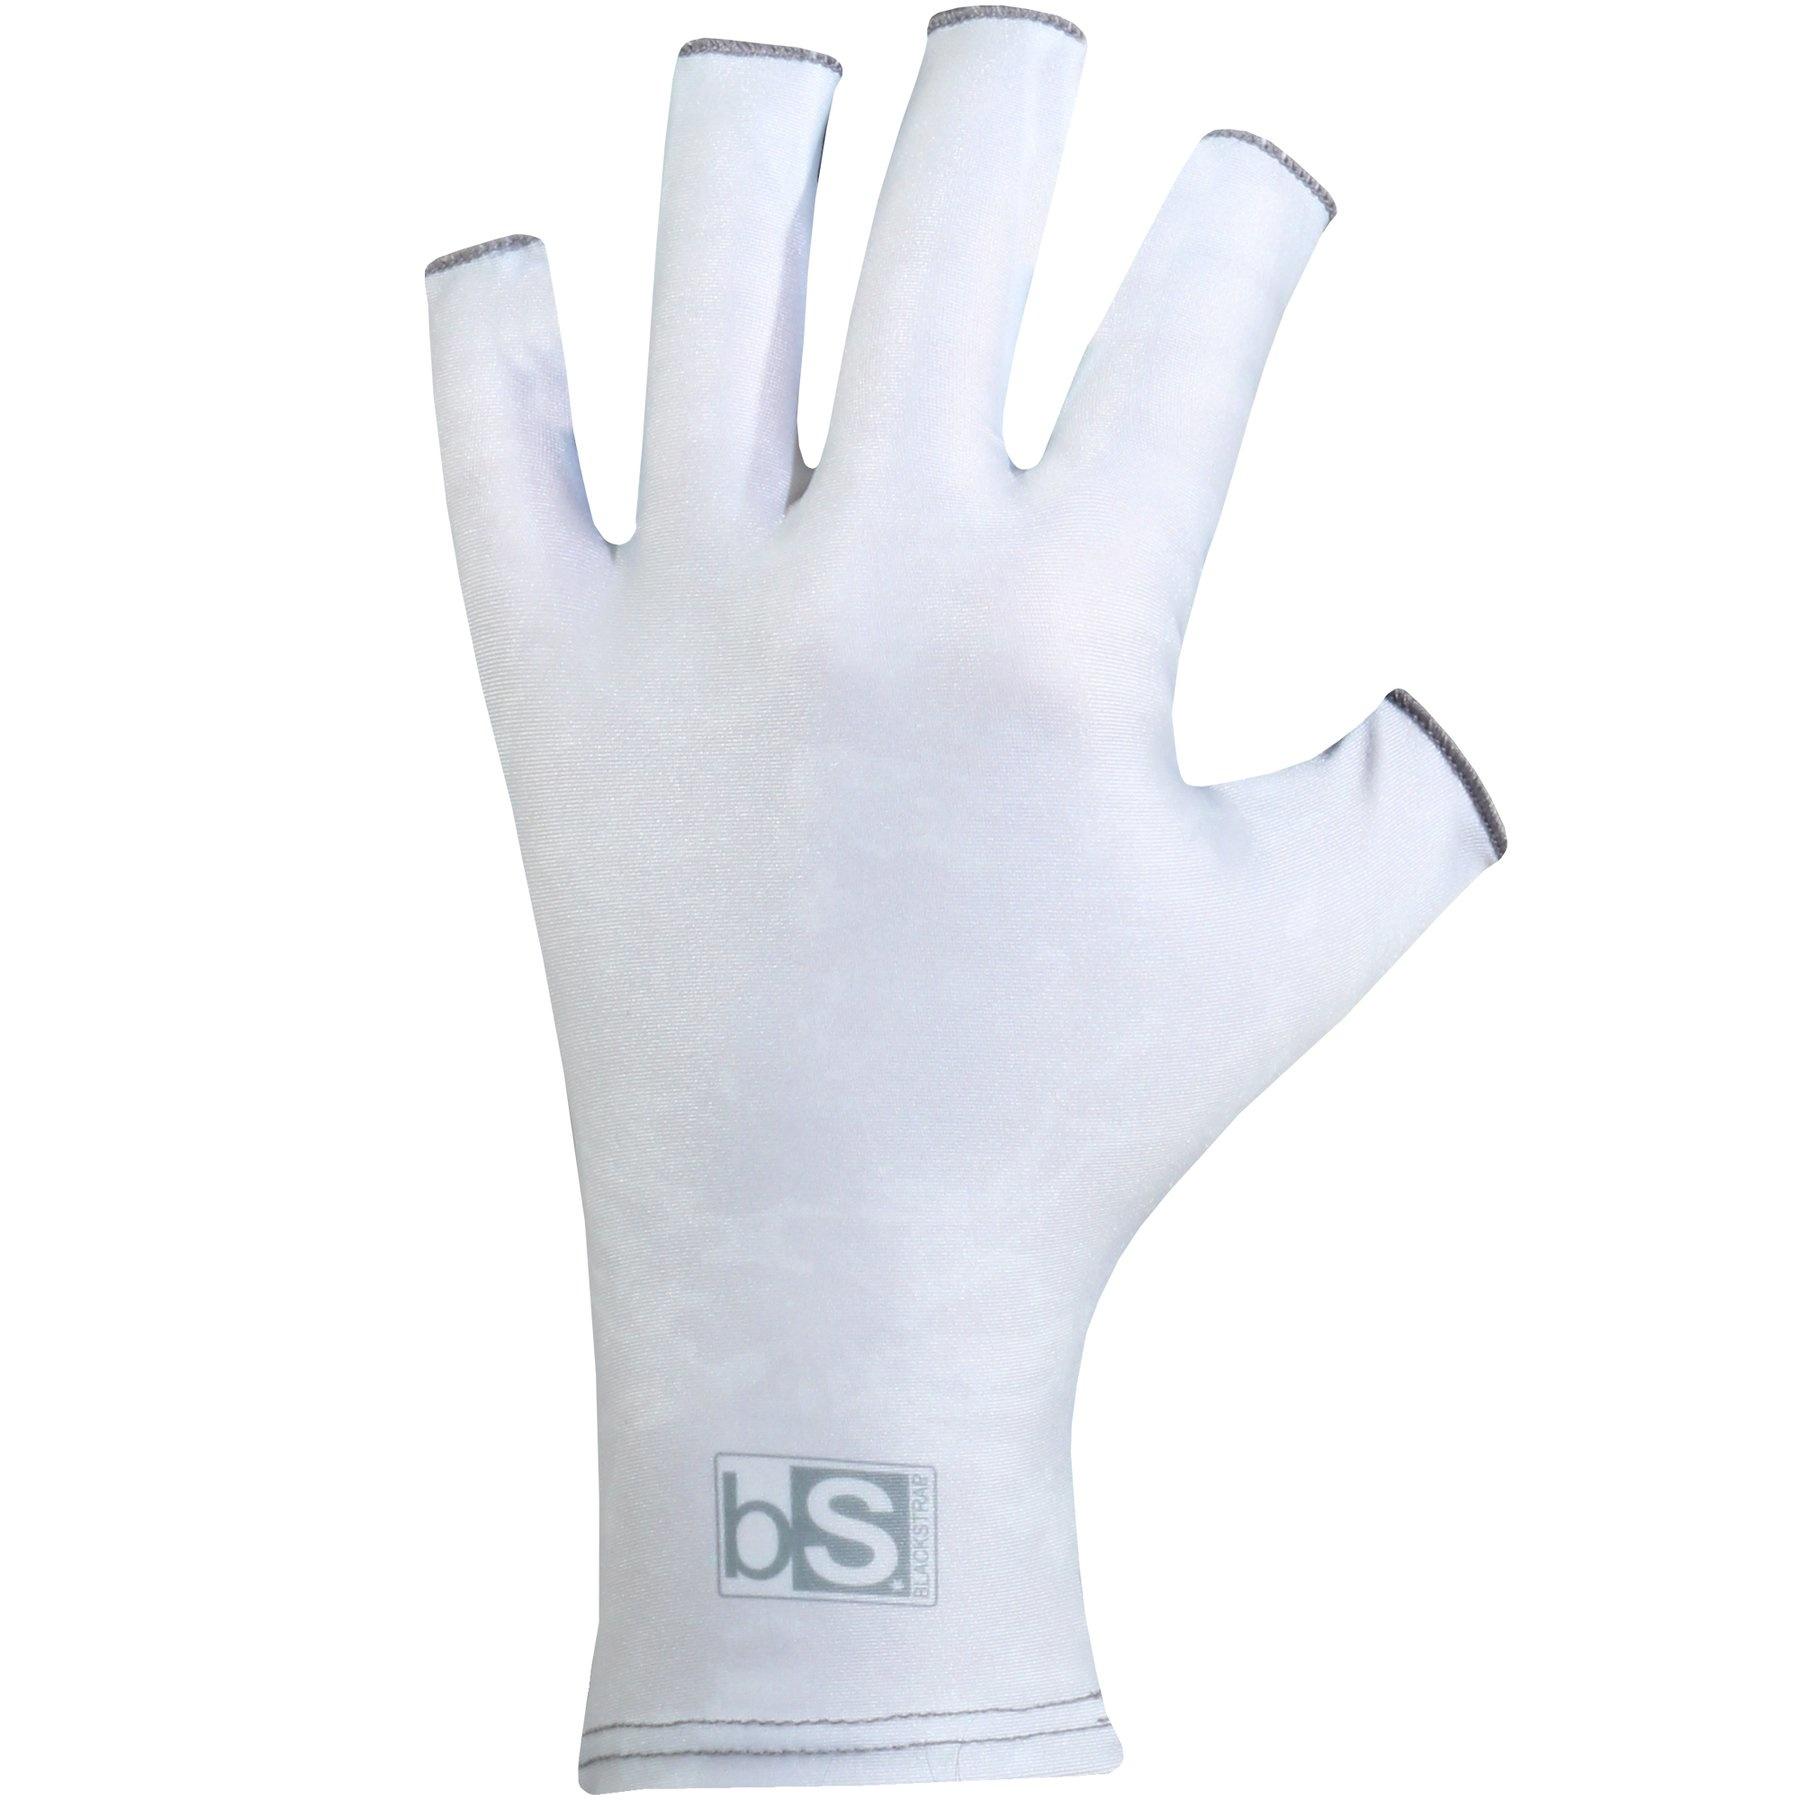 Blackstrap Blackstrap Guide Glove - Light Grey - XS/S